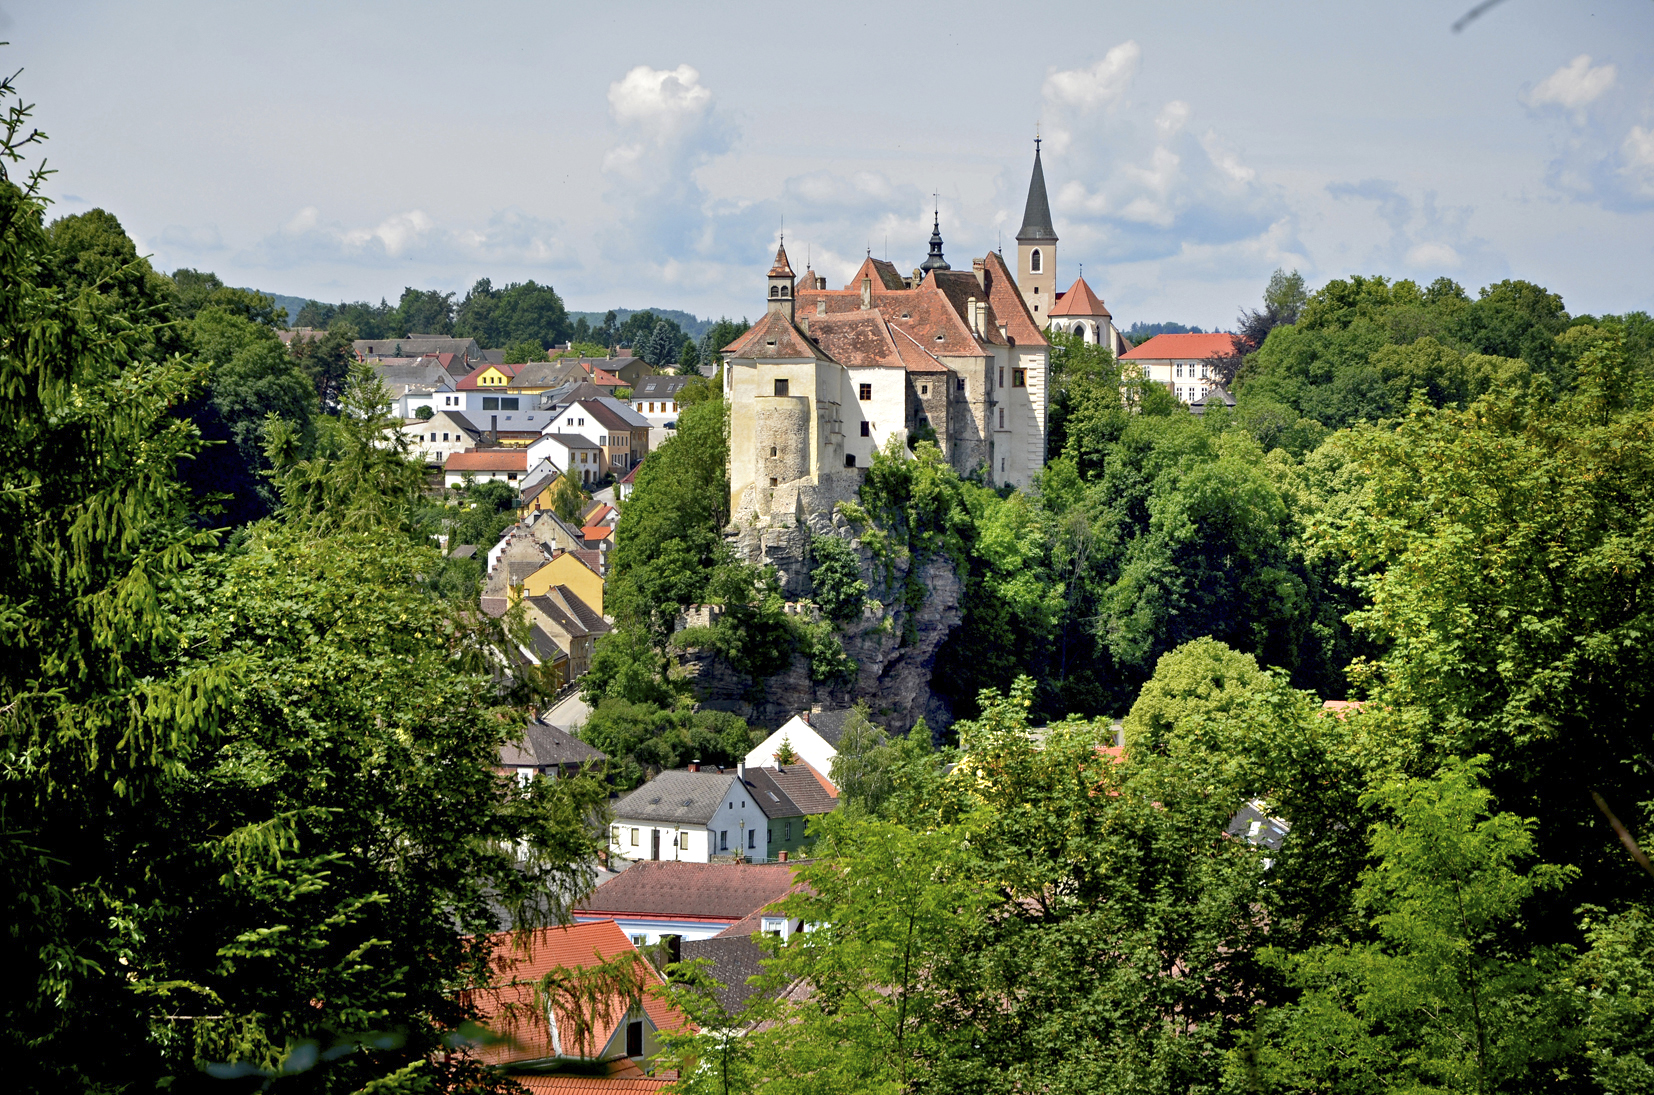 Thayarunde-Schloss Raabs